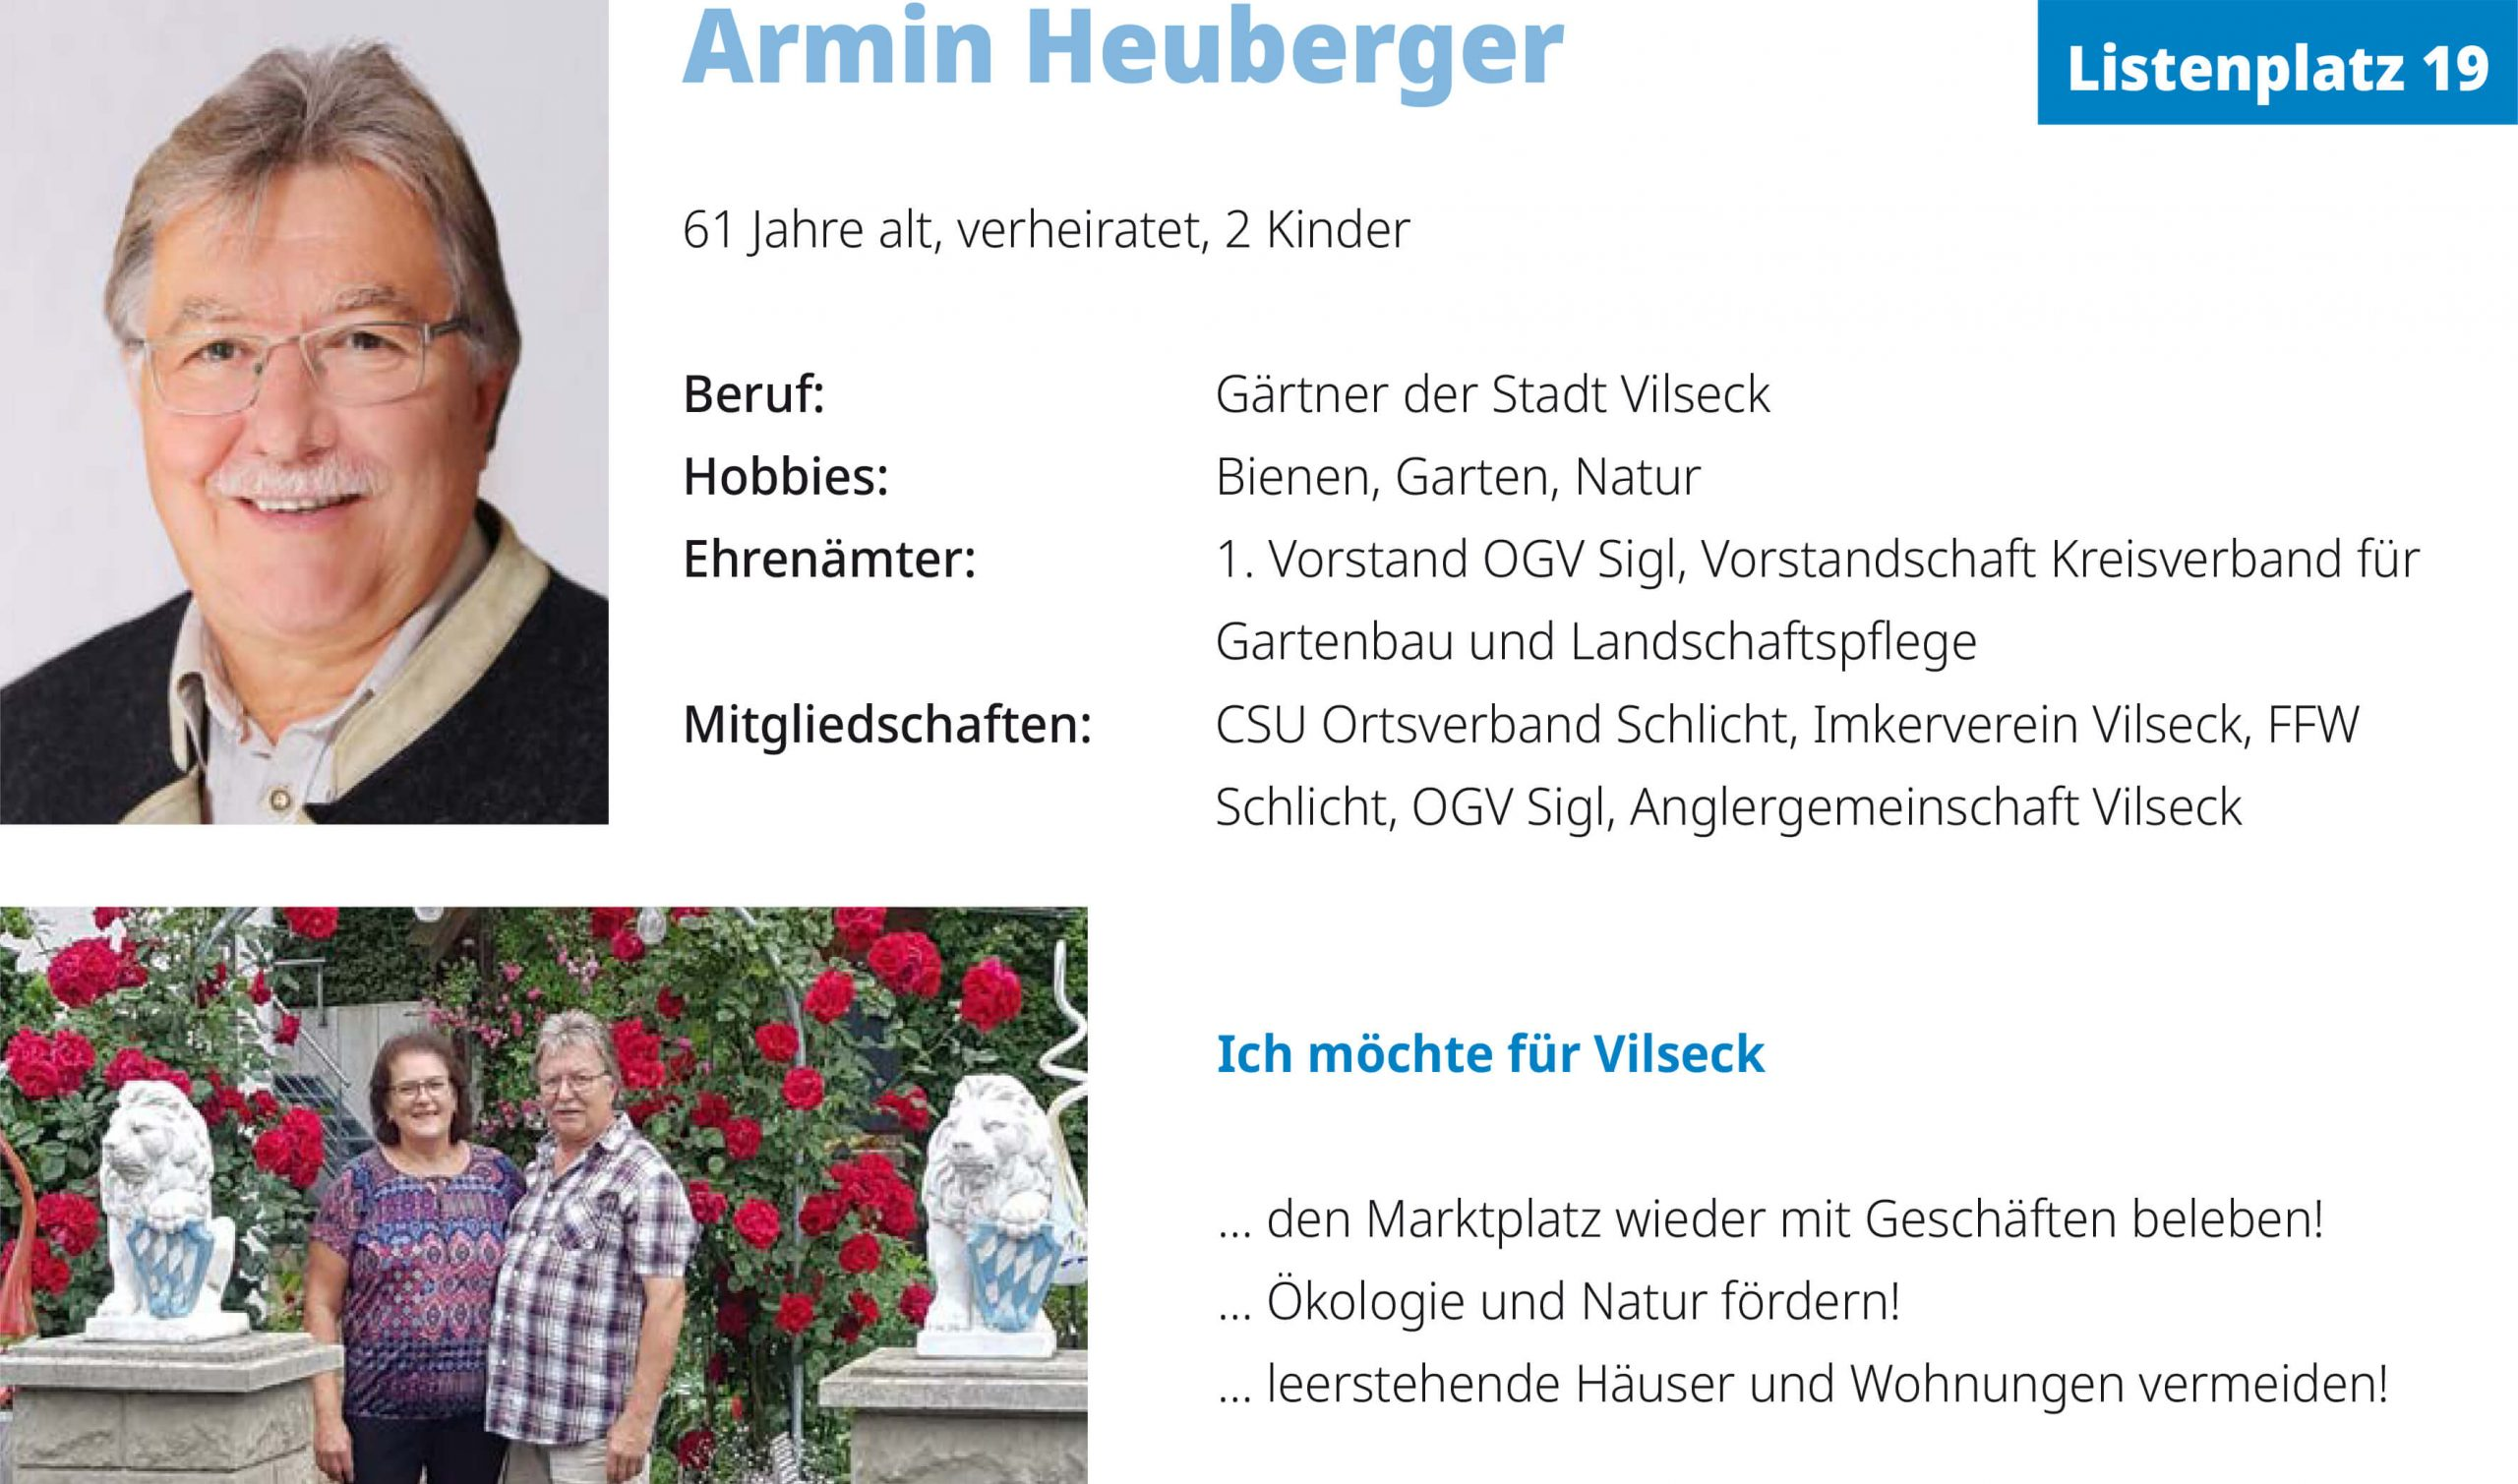 Armin Heuberger